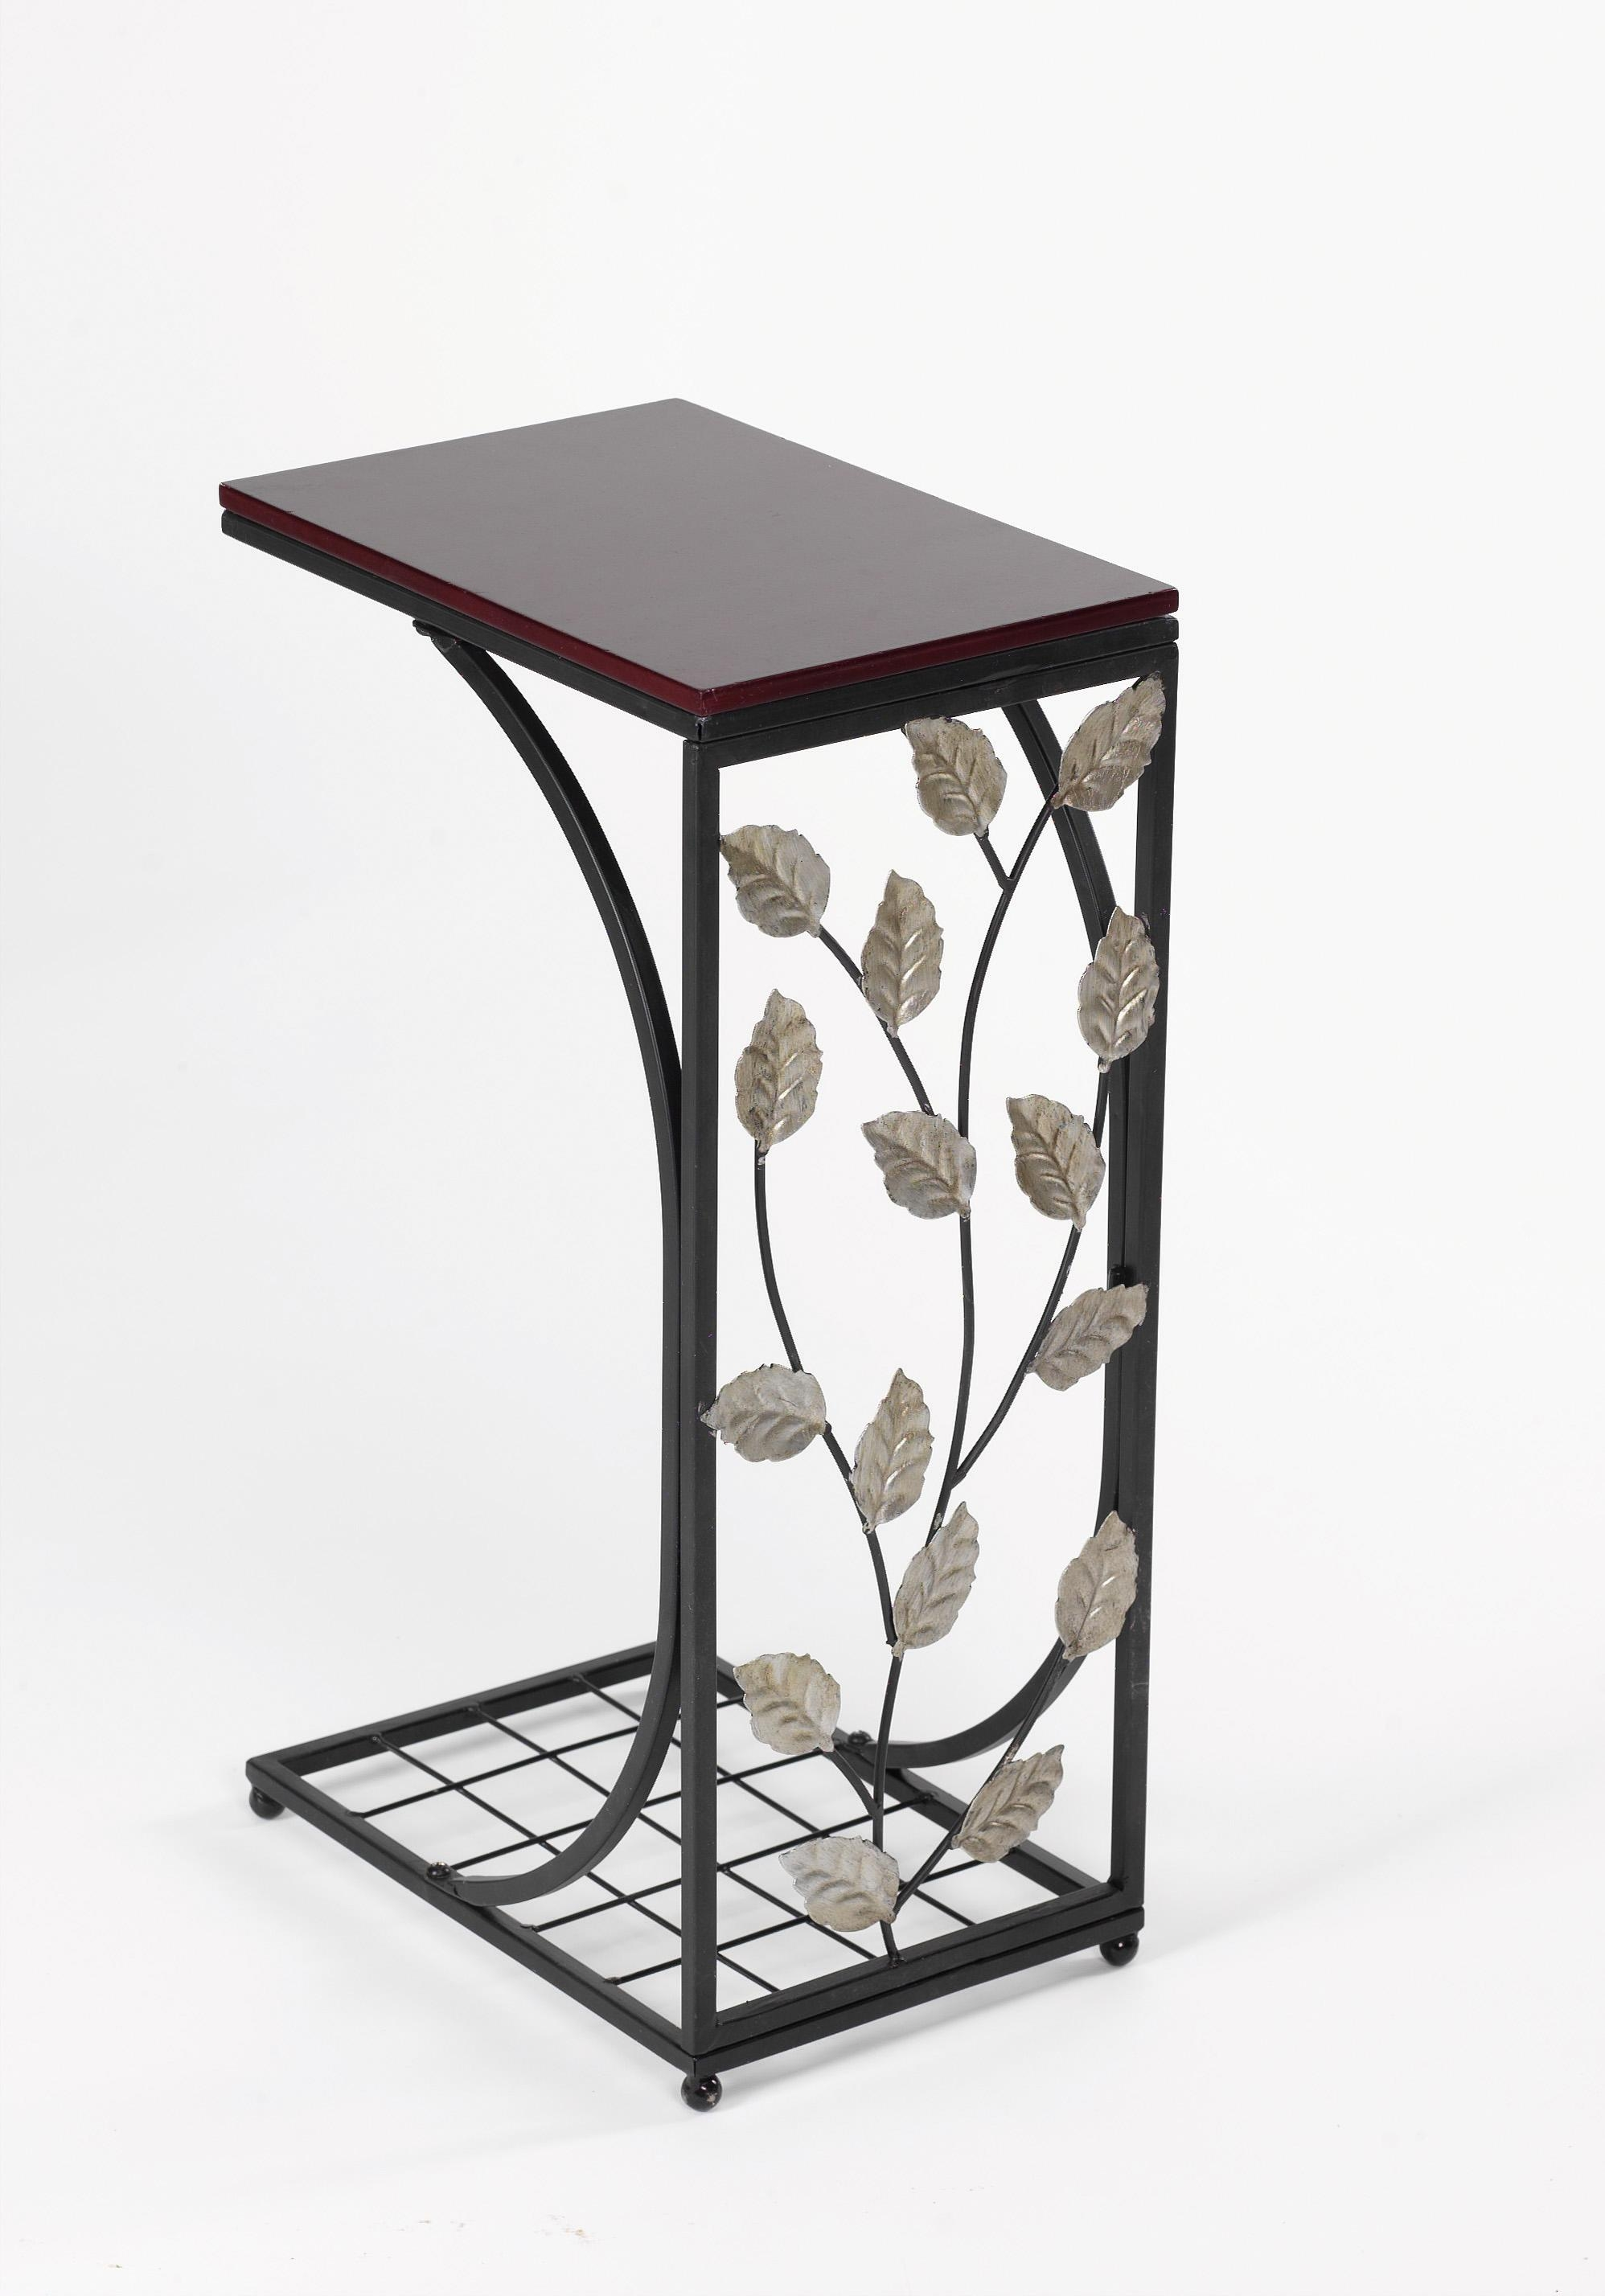 Narrow Sofa Table Uk | Tehranmix Decoration With Regard To Slim Sofa Tables (View 14 of 20)